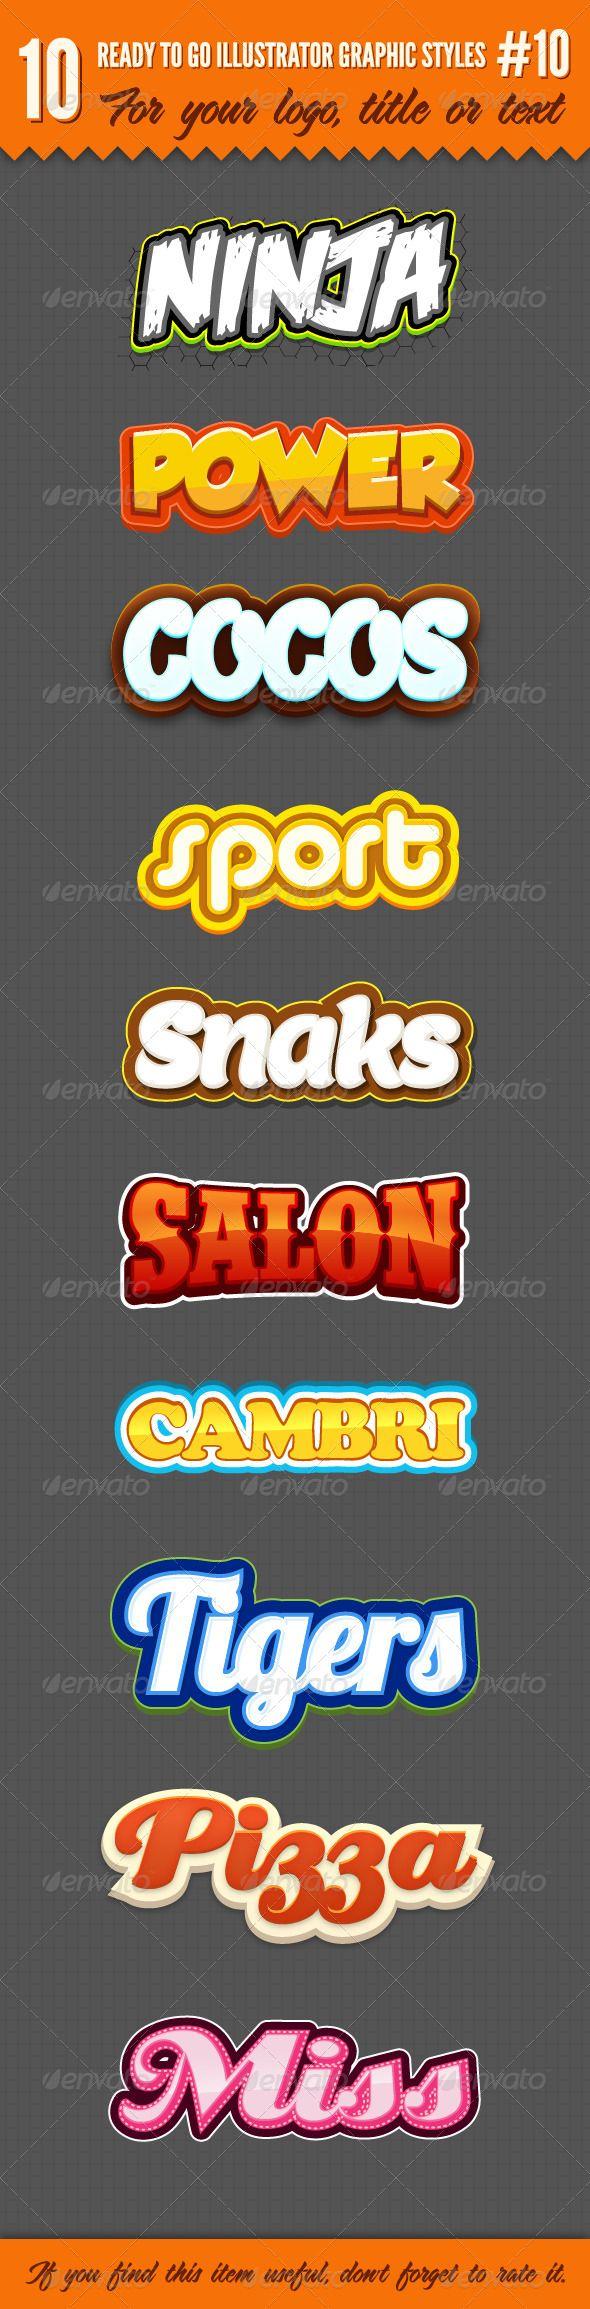 10 Logo Graphic Styles #10